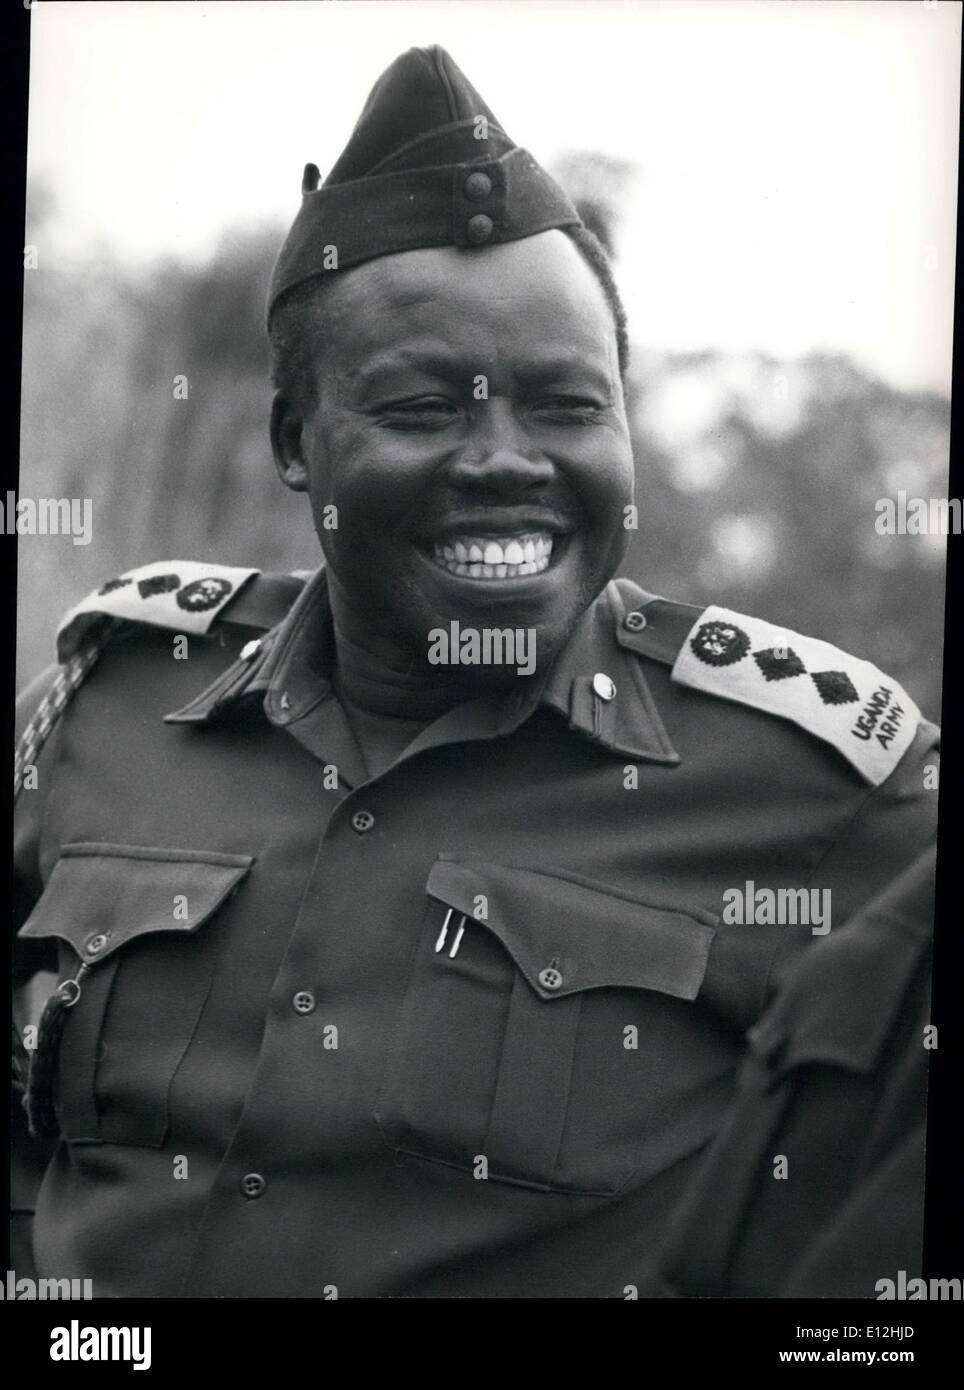 Feb. 24, 2012 - Lieutenant colonel Khamis safi, leader of Religious affairs, Uganda army. - Stock Image